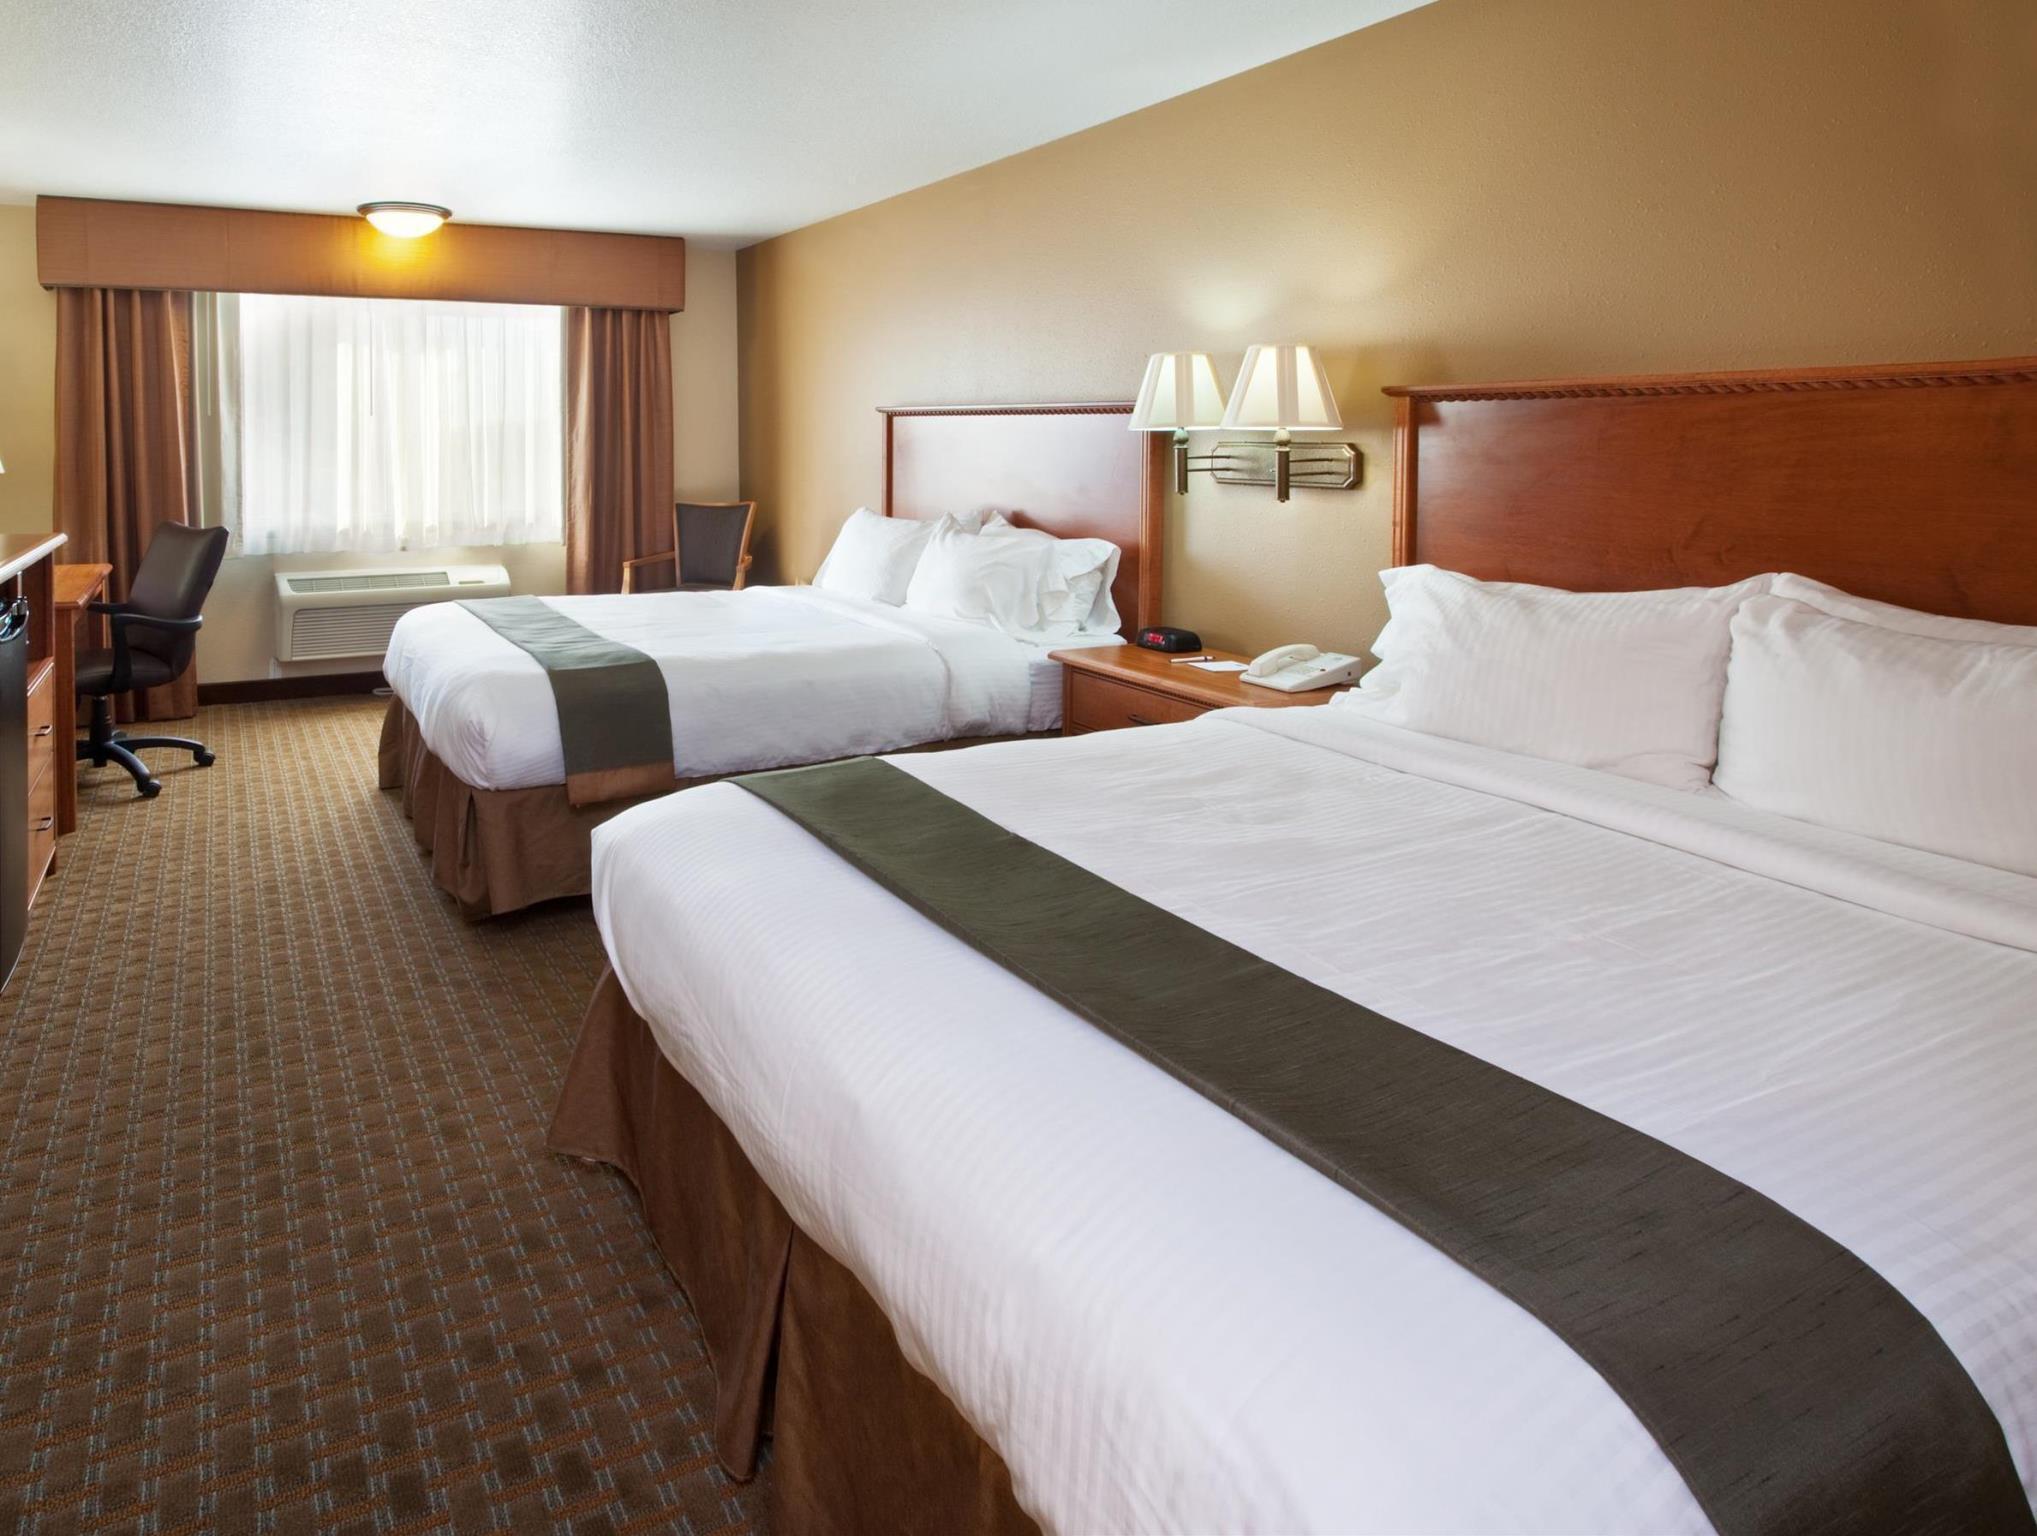 2 Queen Beds Oversized Room Kitchen Best Western Empire Towers